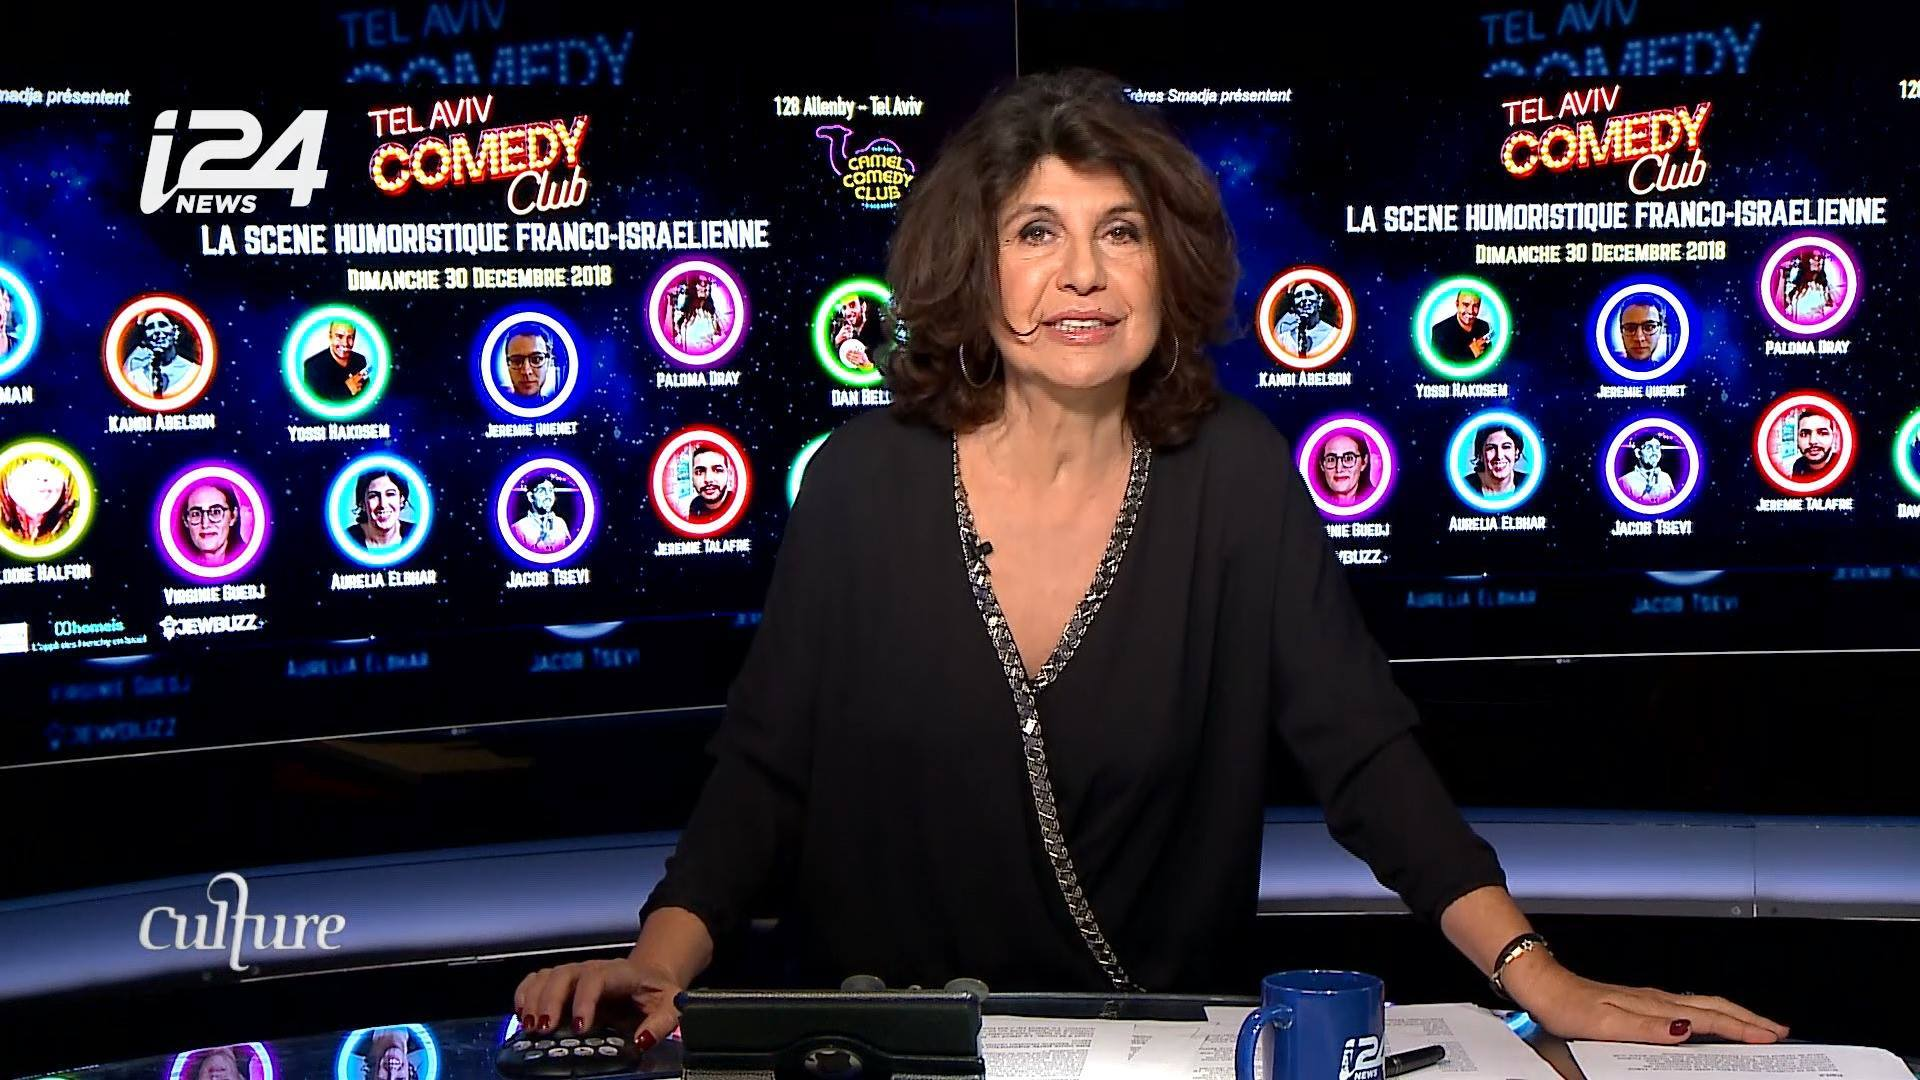 TLV Comedy Club, STAND-UP Franco-israélien sur I24News